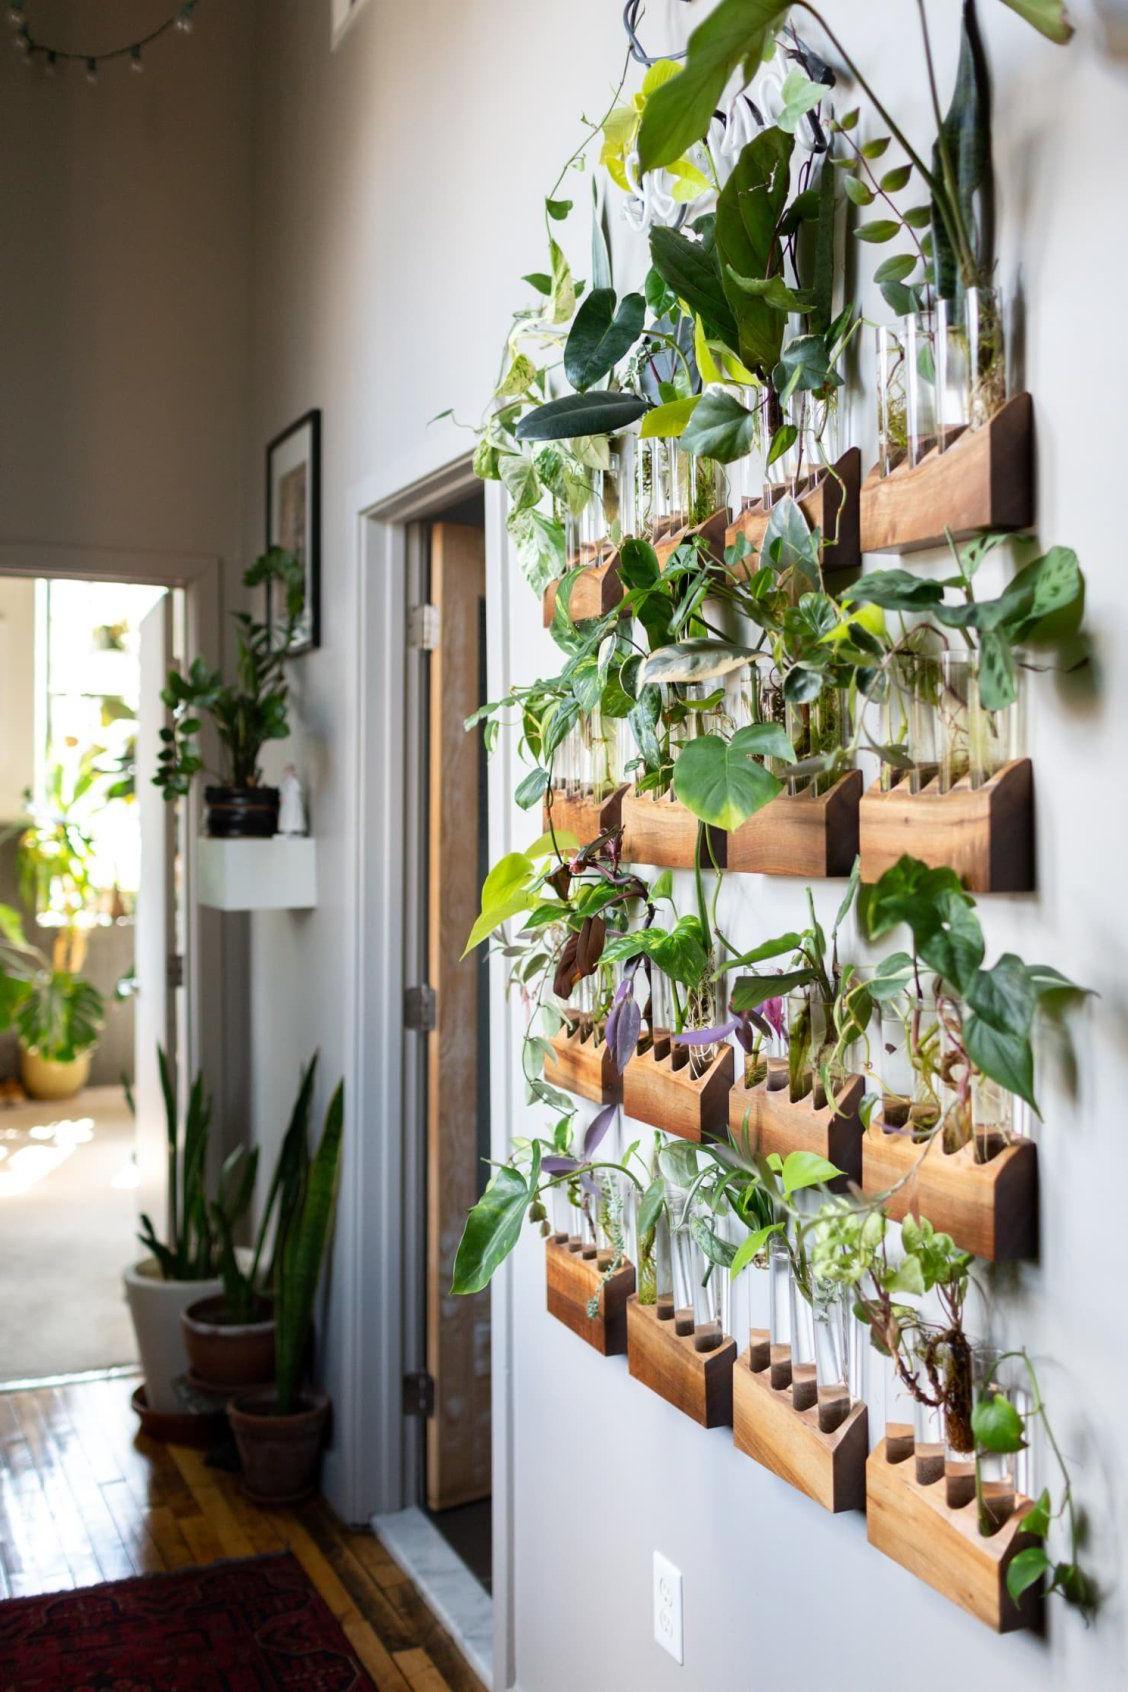 Interior, Home Decor, House Interior Regarding Olive/gray Metal Wall Decor By Brayden Studio (View 13 of 20)